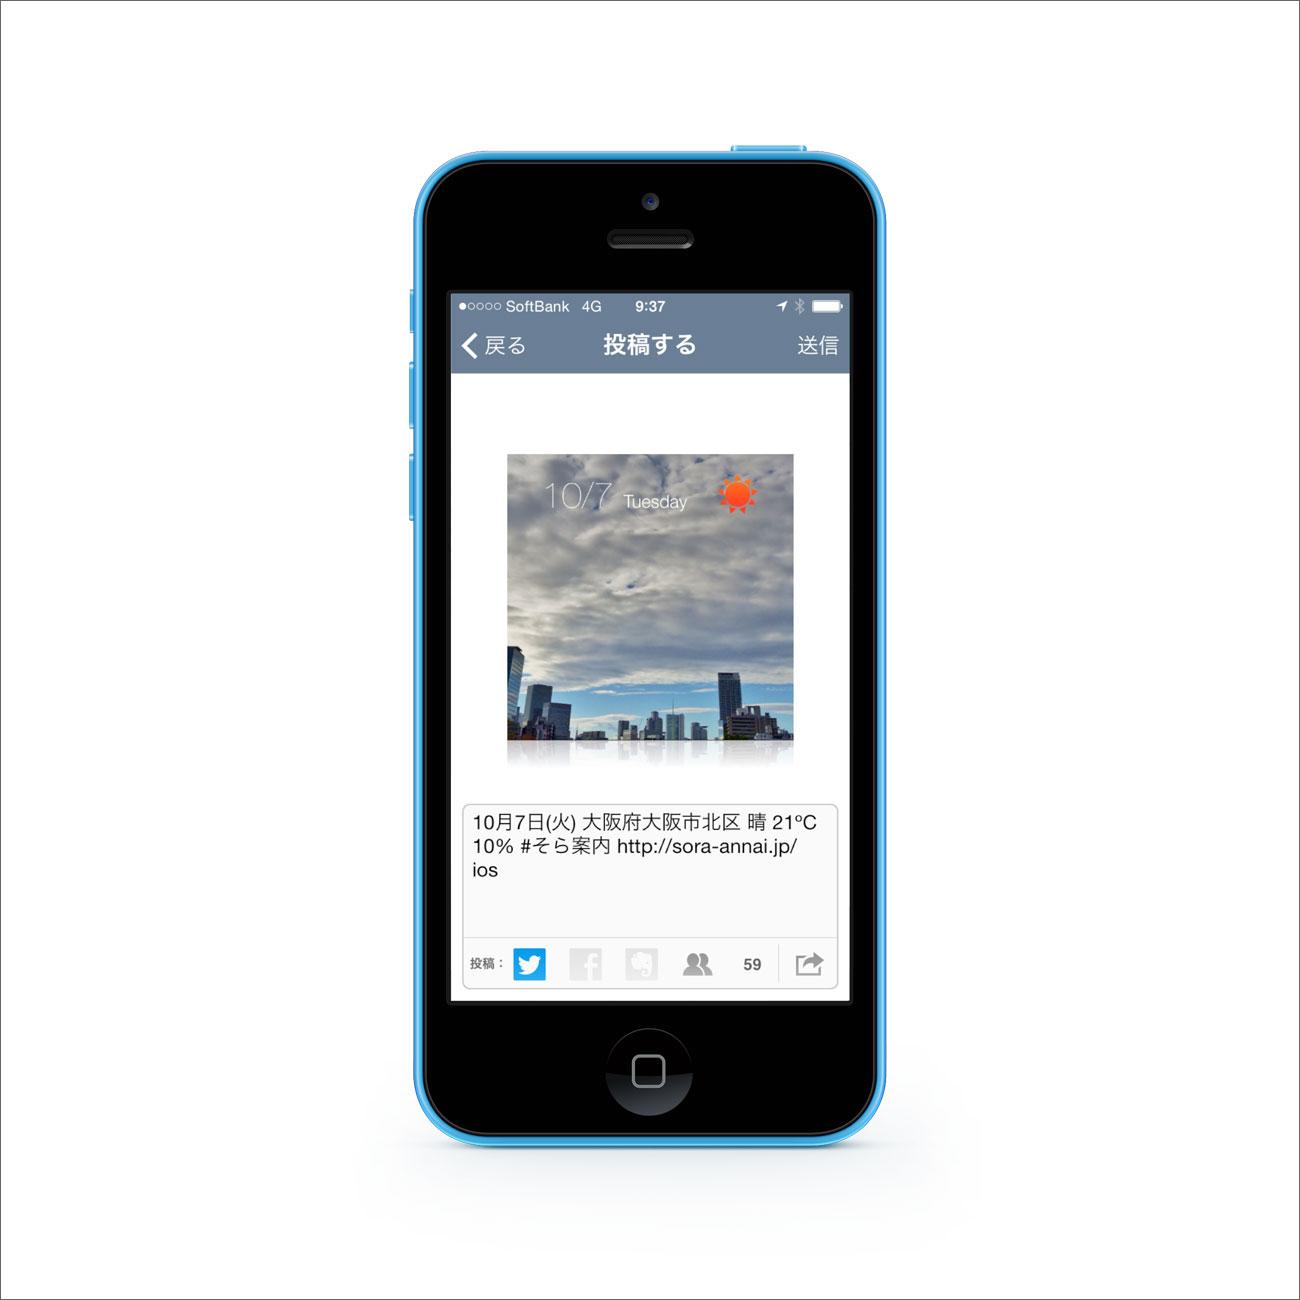 iOS用お天気アプリ「そら案内」写真投稿画面